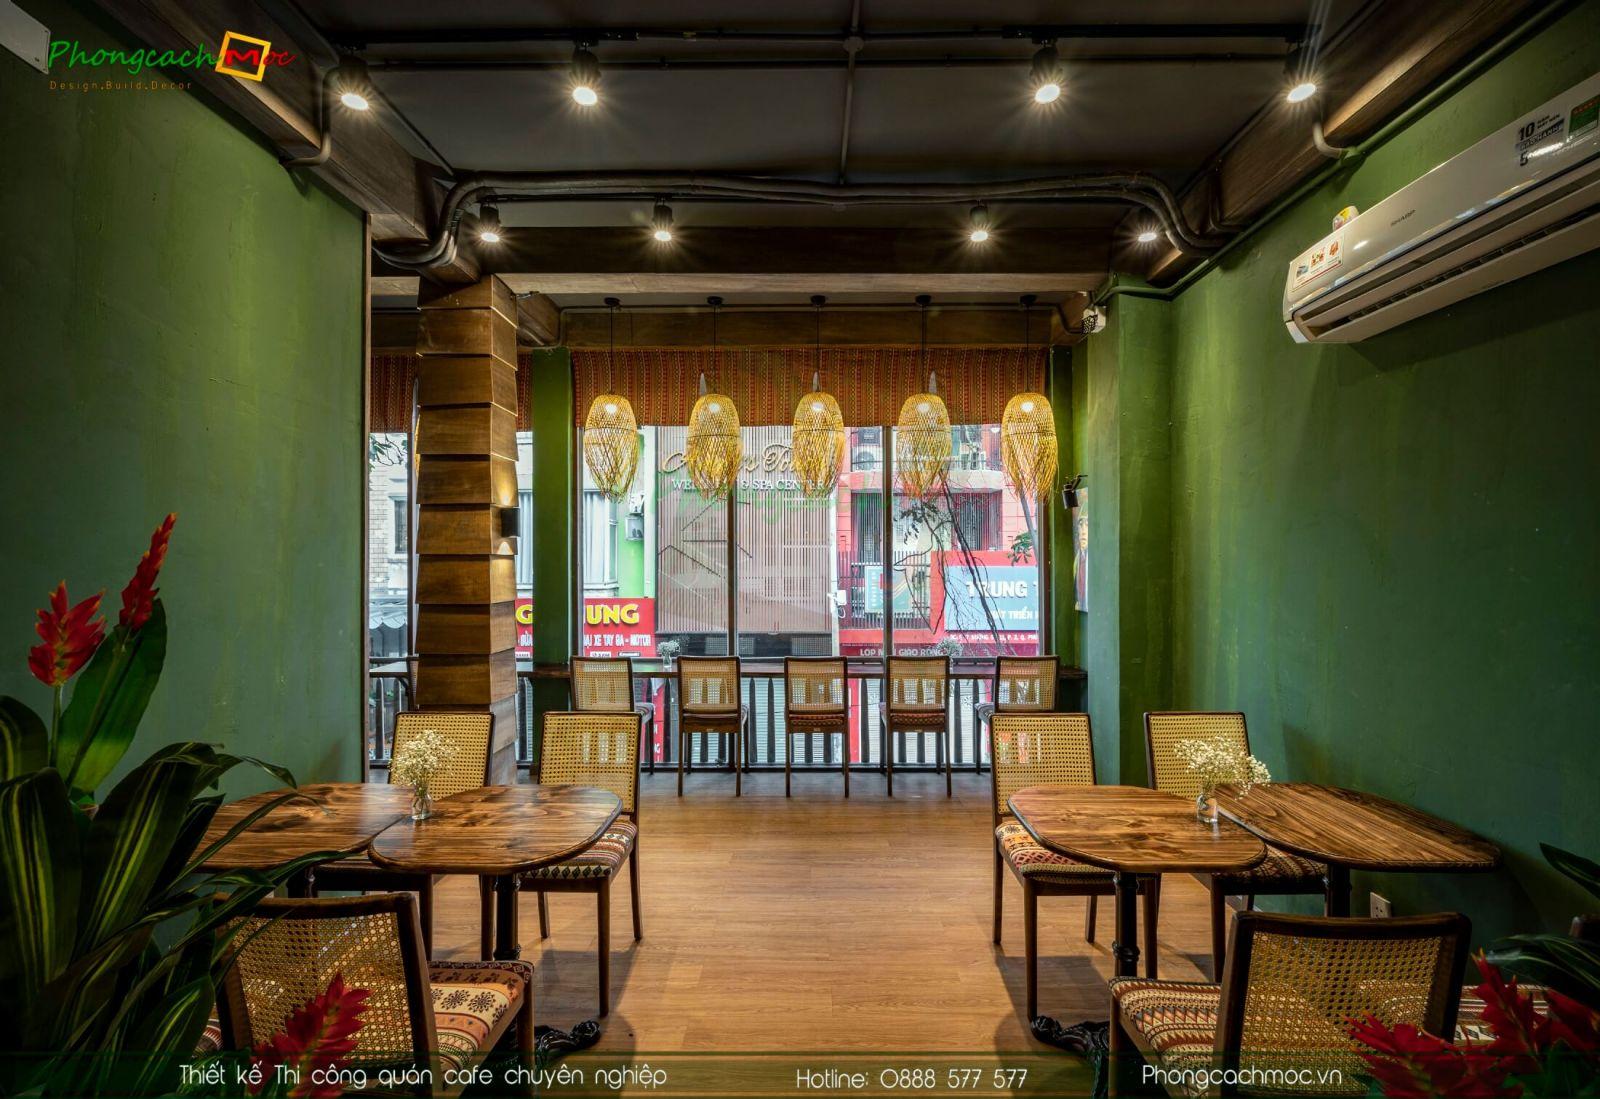 thiet-ke-thi-cong-hoan-thien-quan-cafe-nha-cua-mi73